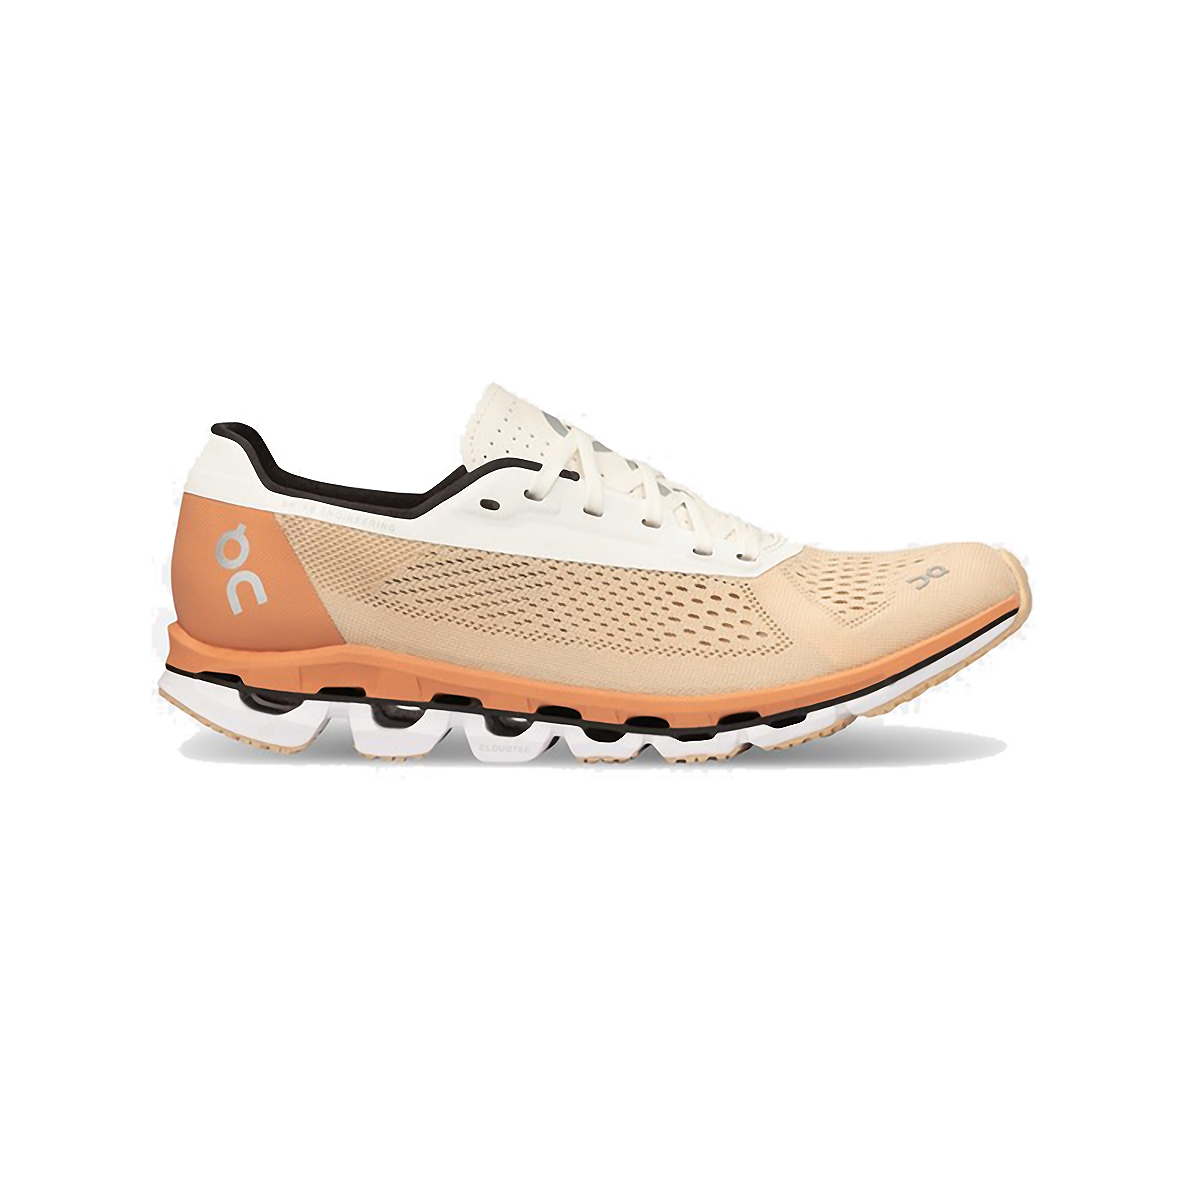 Women's On Cloudboom Running Shoe - Color: Savannah/White - Size: 5.5 - Width: Regular, Savannah/White, large, image 1